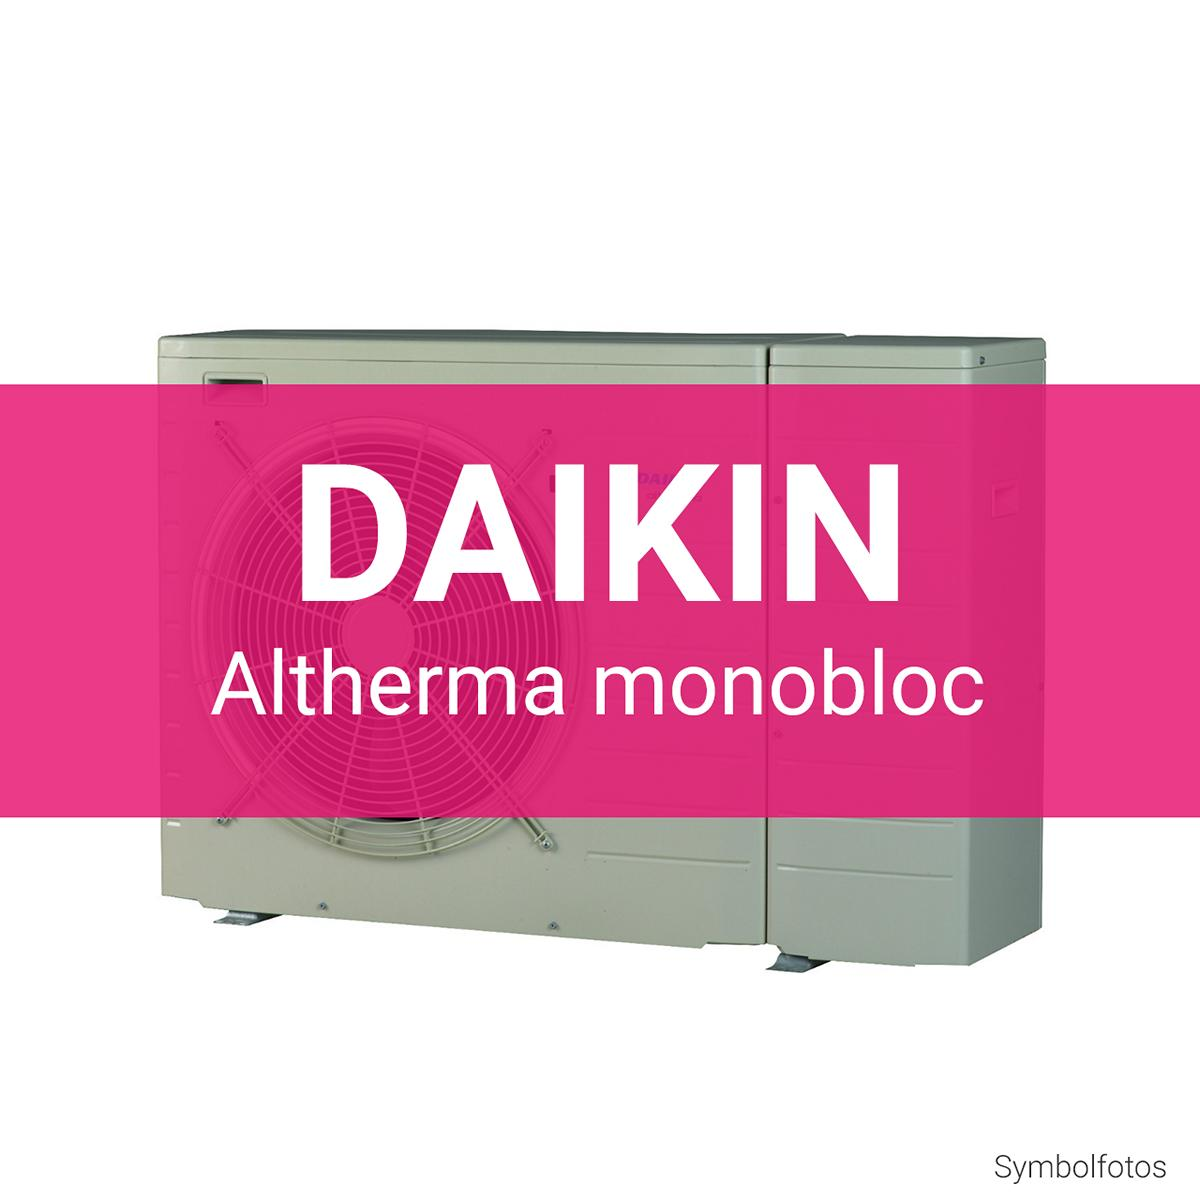 Daikin Altherma monobloc